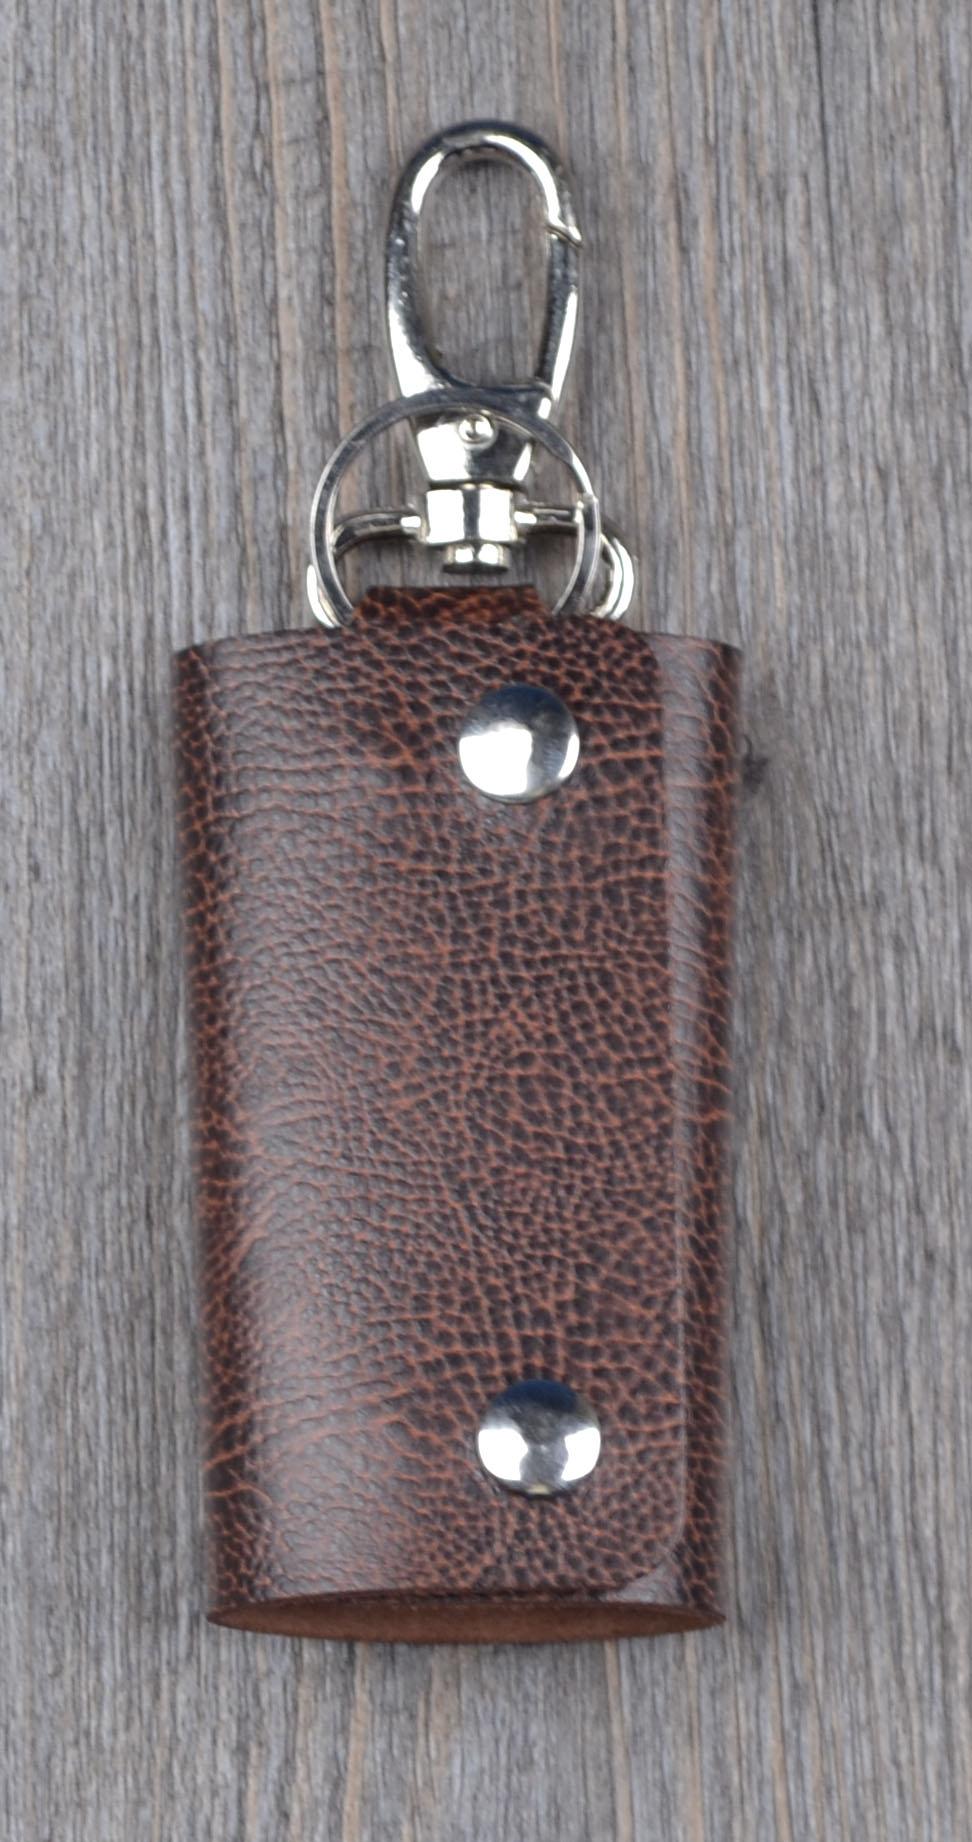 3d3b5622d London Knicker Vintage Handmade Leather Key Holder Wallet LC121 | Super  Hero Jackets, Movies Jackets, Fashion Jackets, Motorcycle Jackets